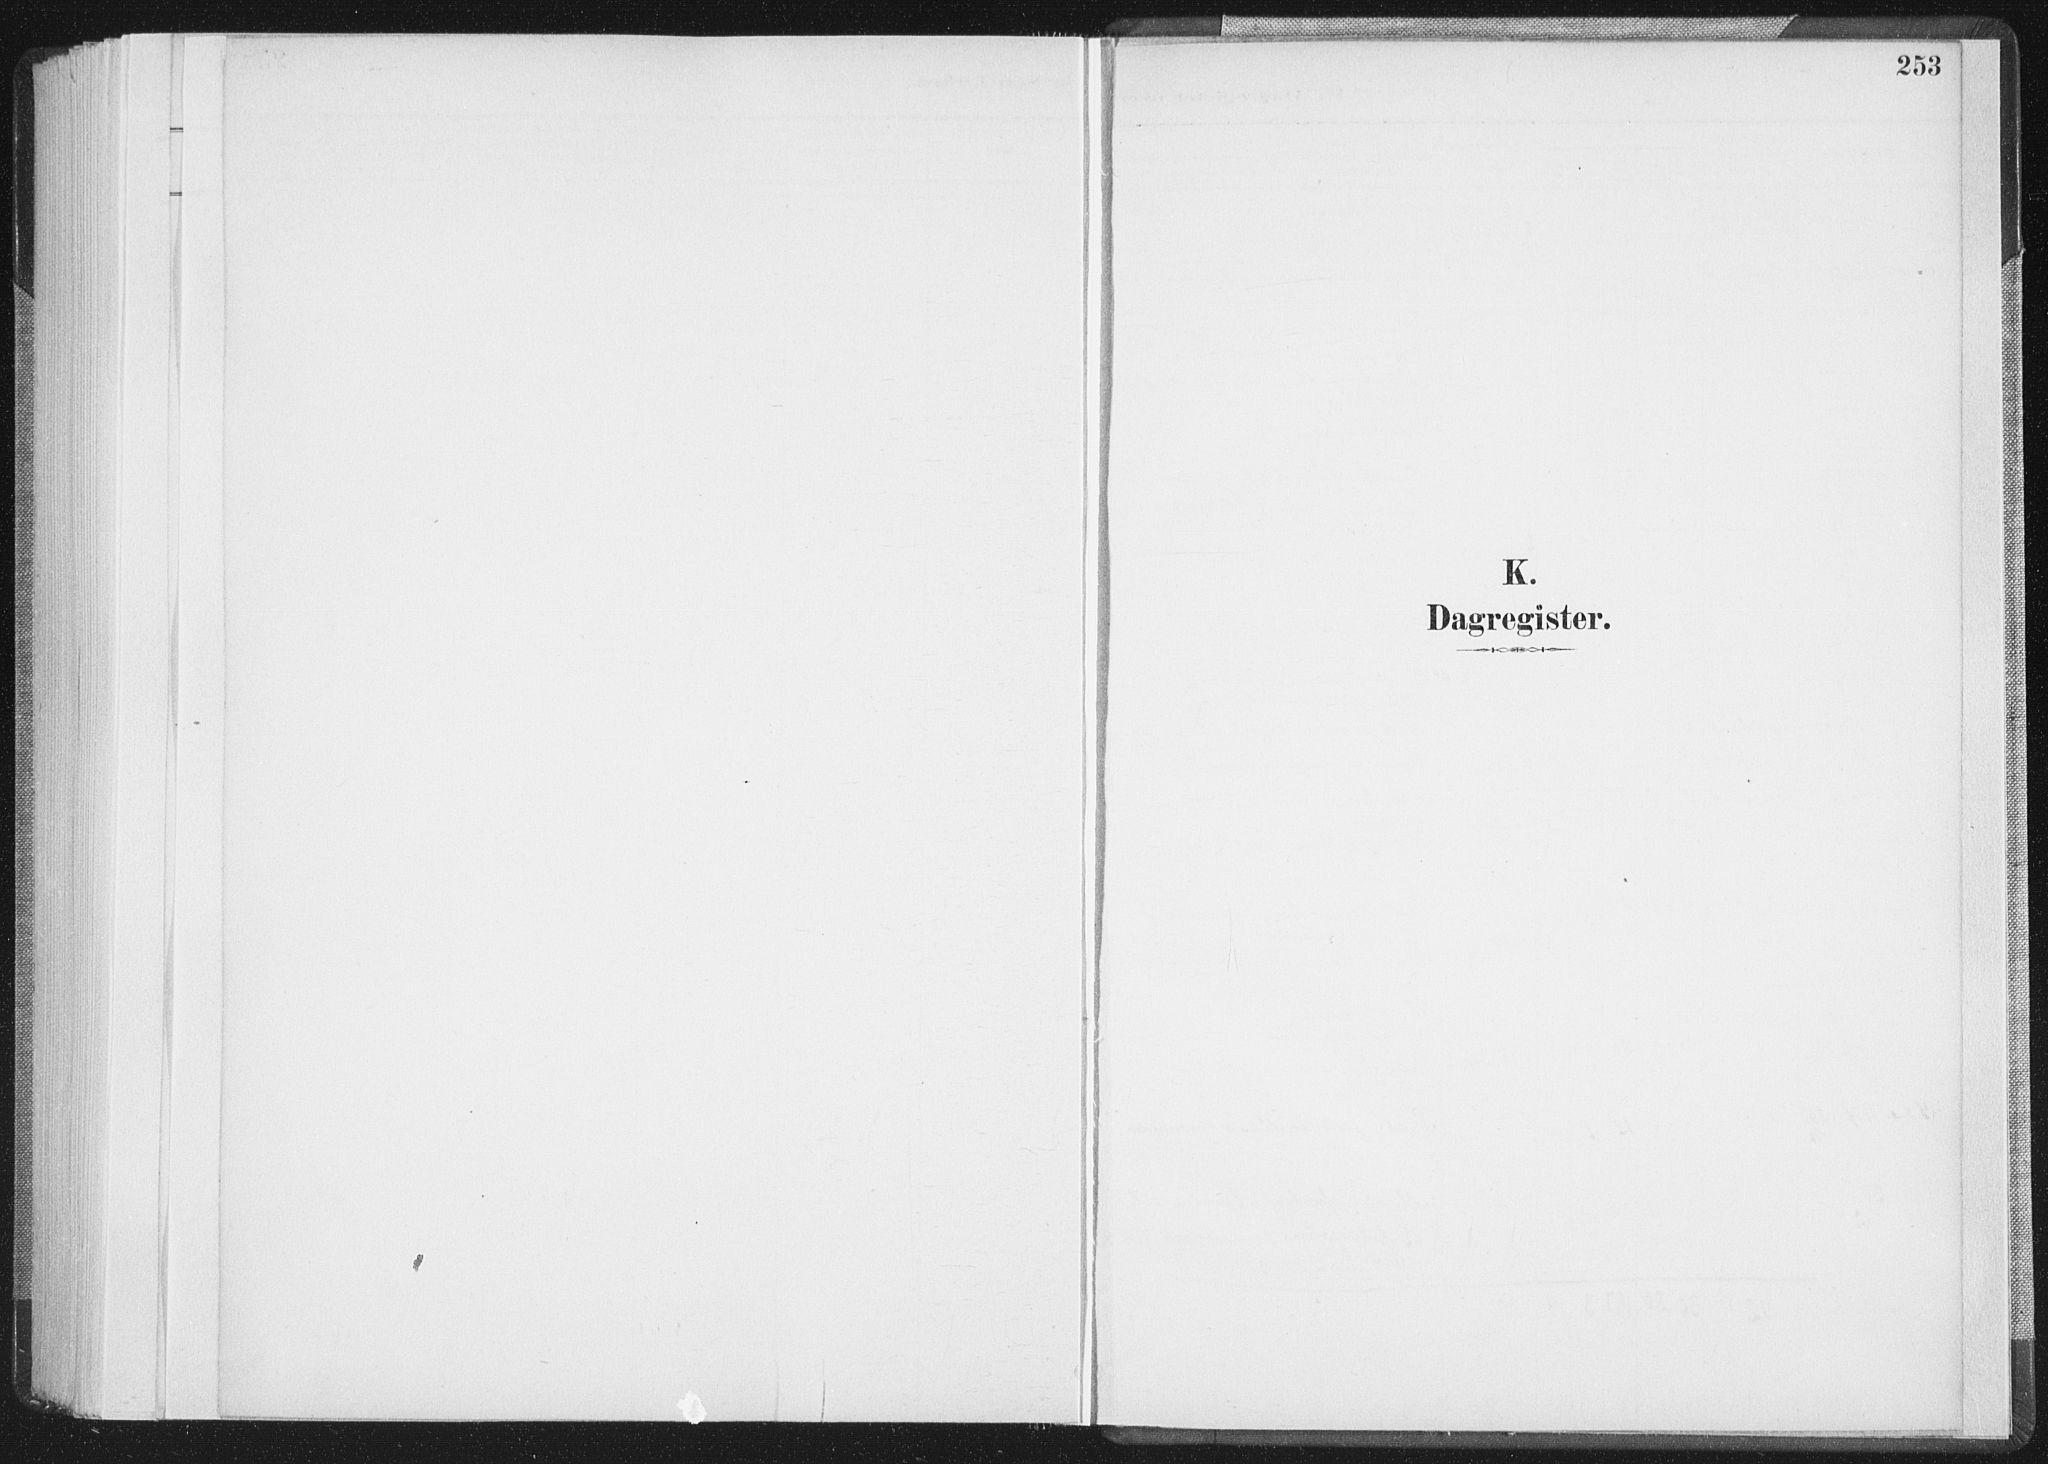 SAT, Ministerialprotokoller, klokkerbøker og fødselsregistre - Nordland, 898/L1422: Ministerialbok nr. 898A02, 1887-1908, s. 253